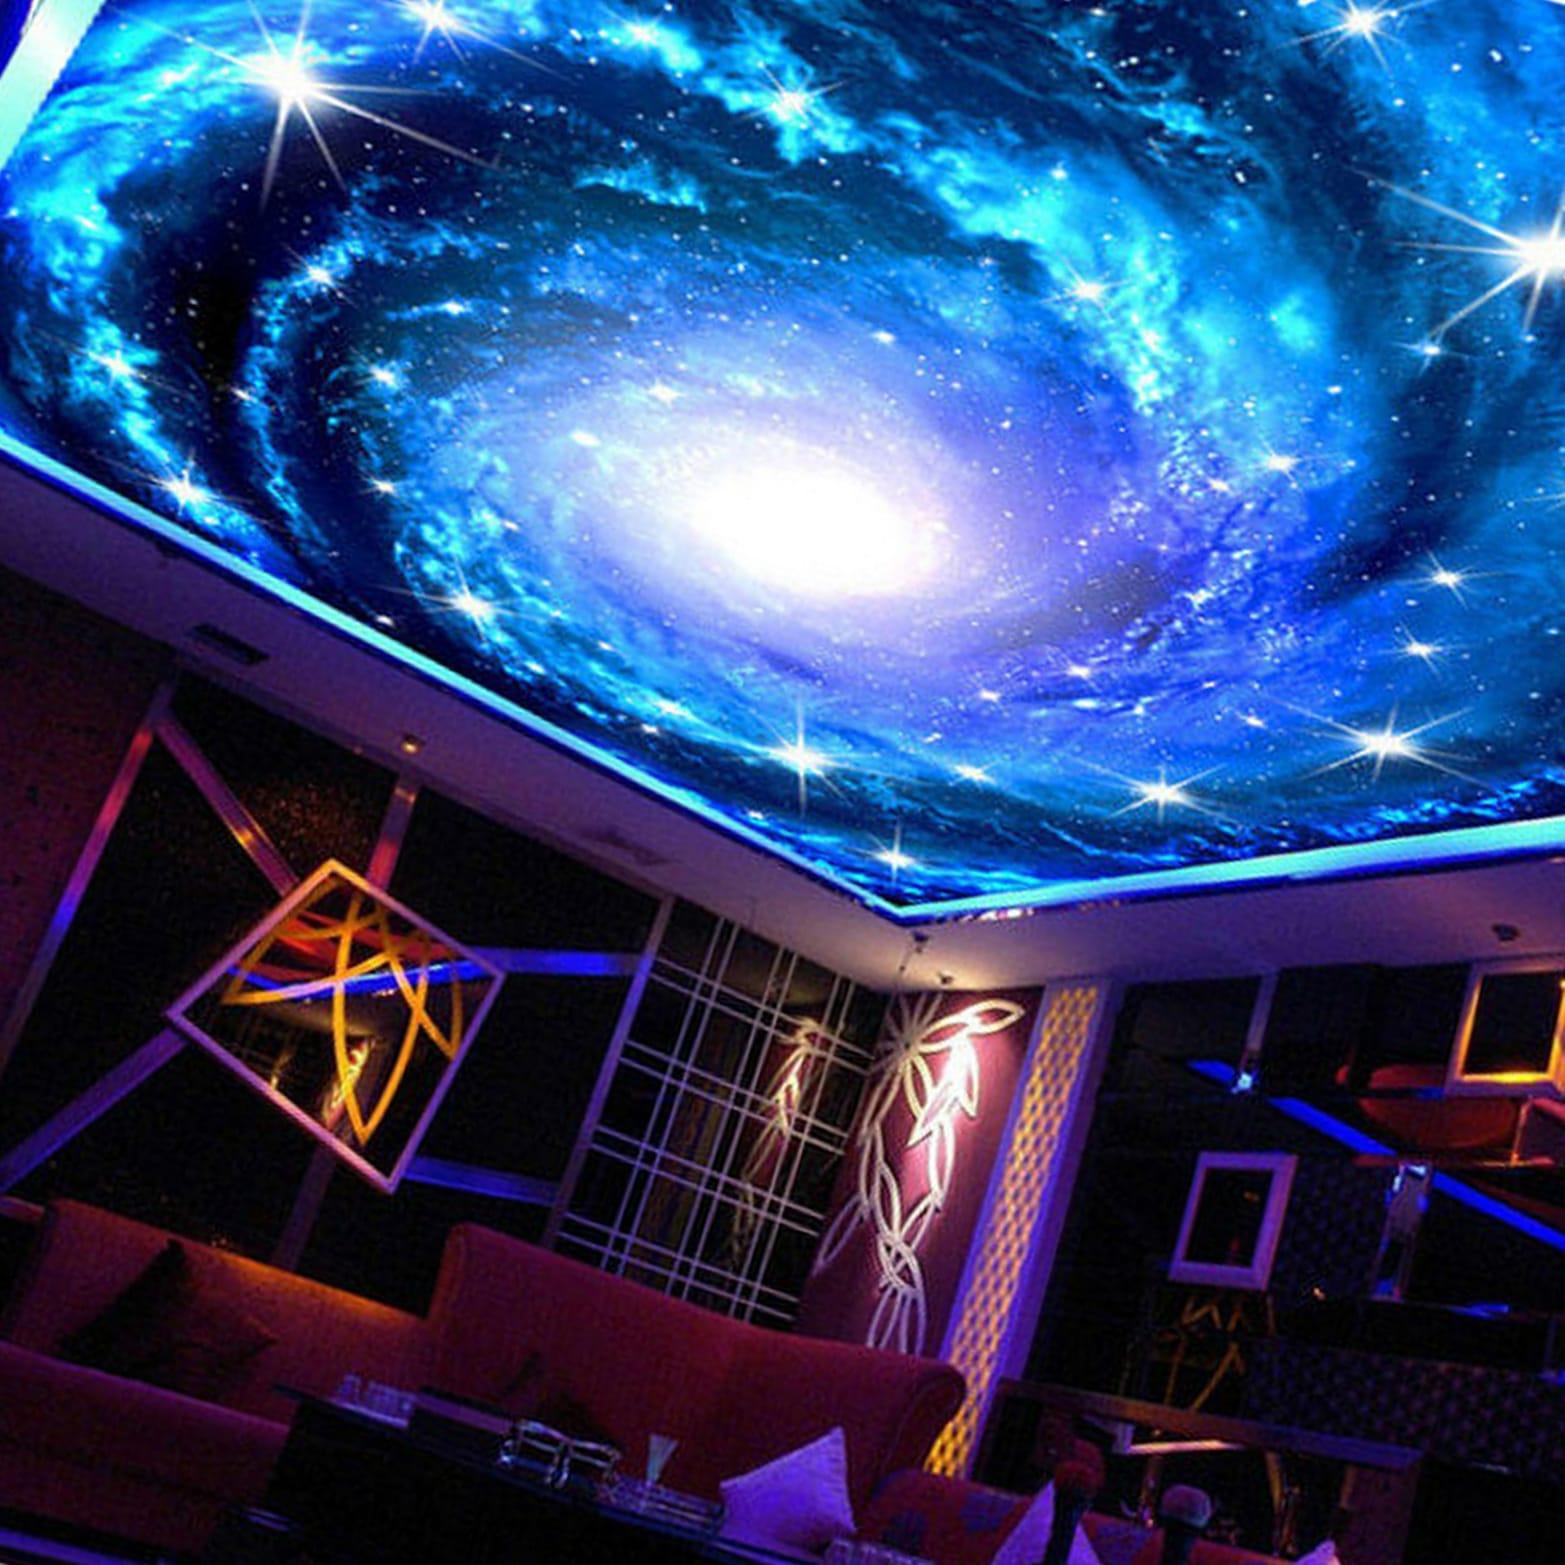 Потолок звездное небо 1